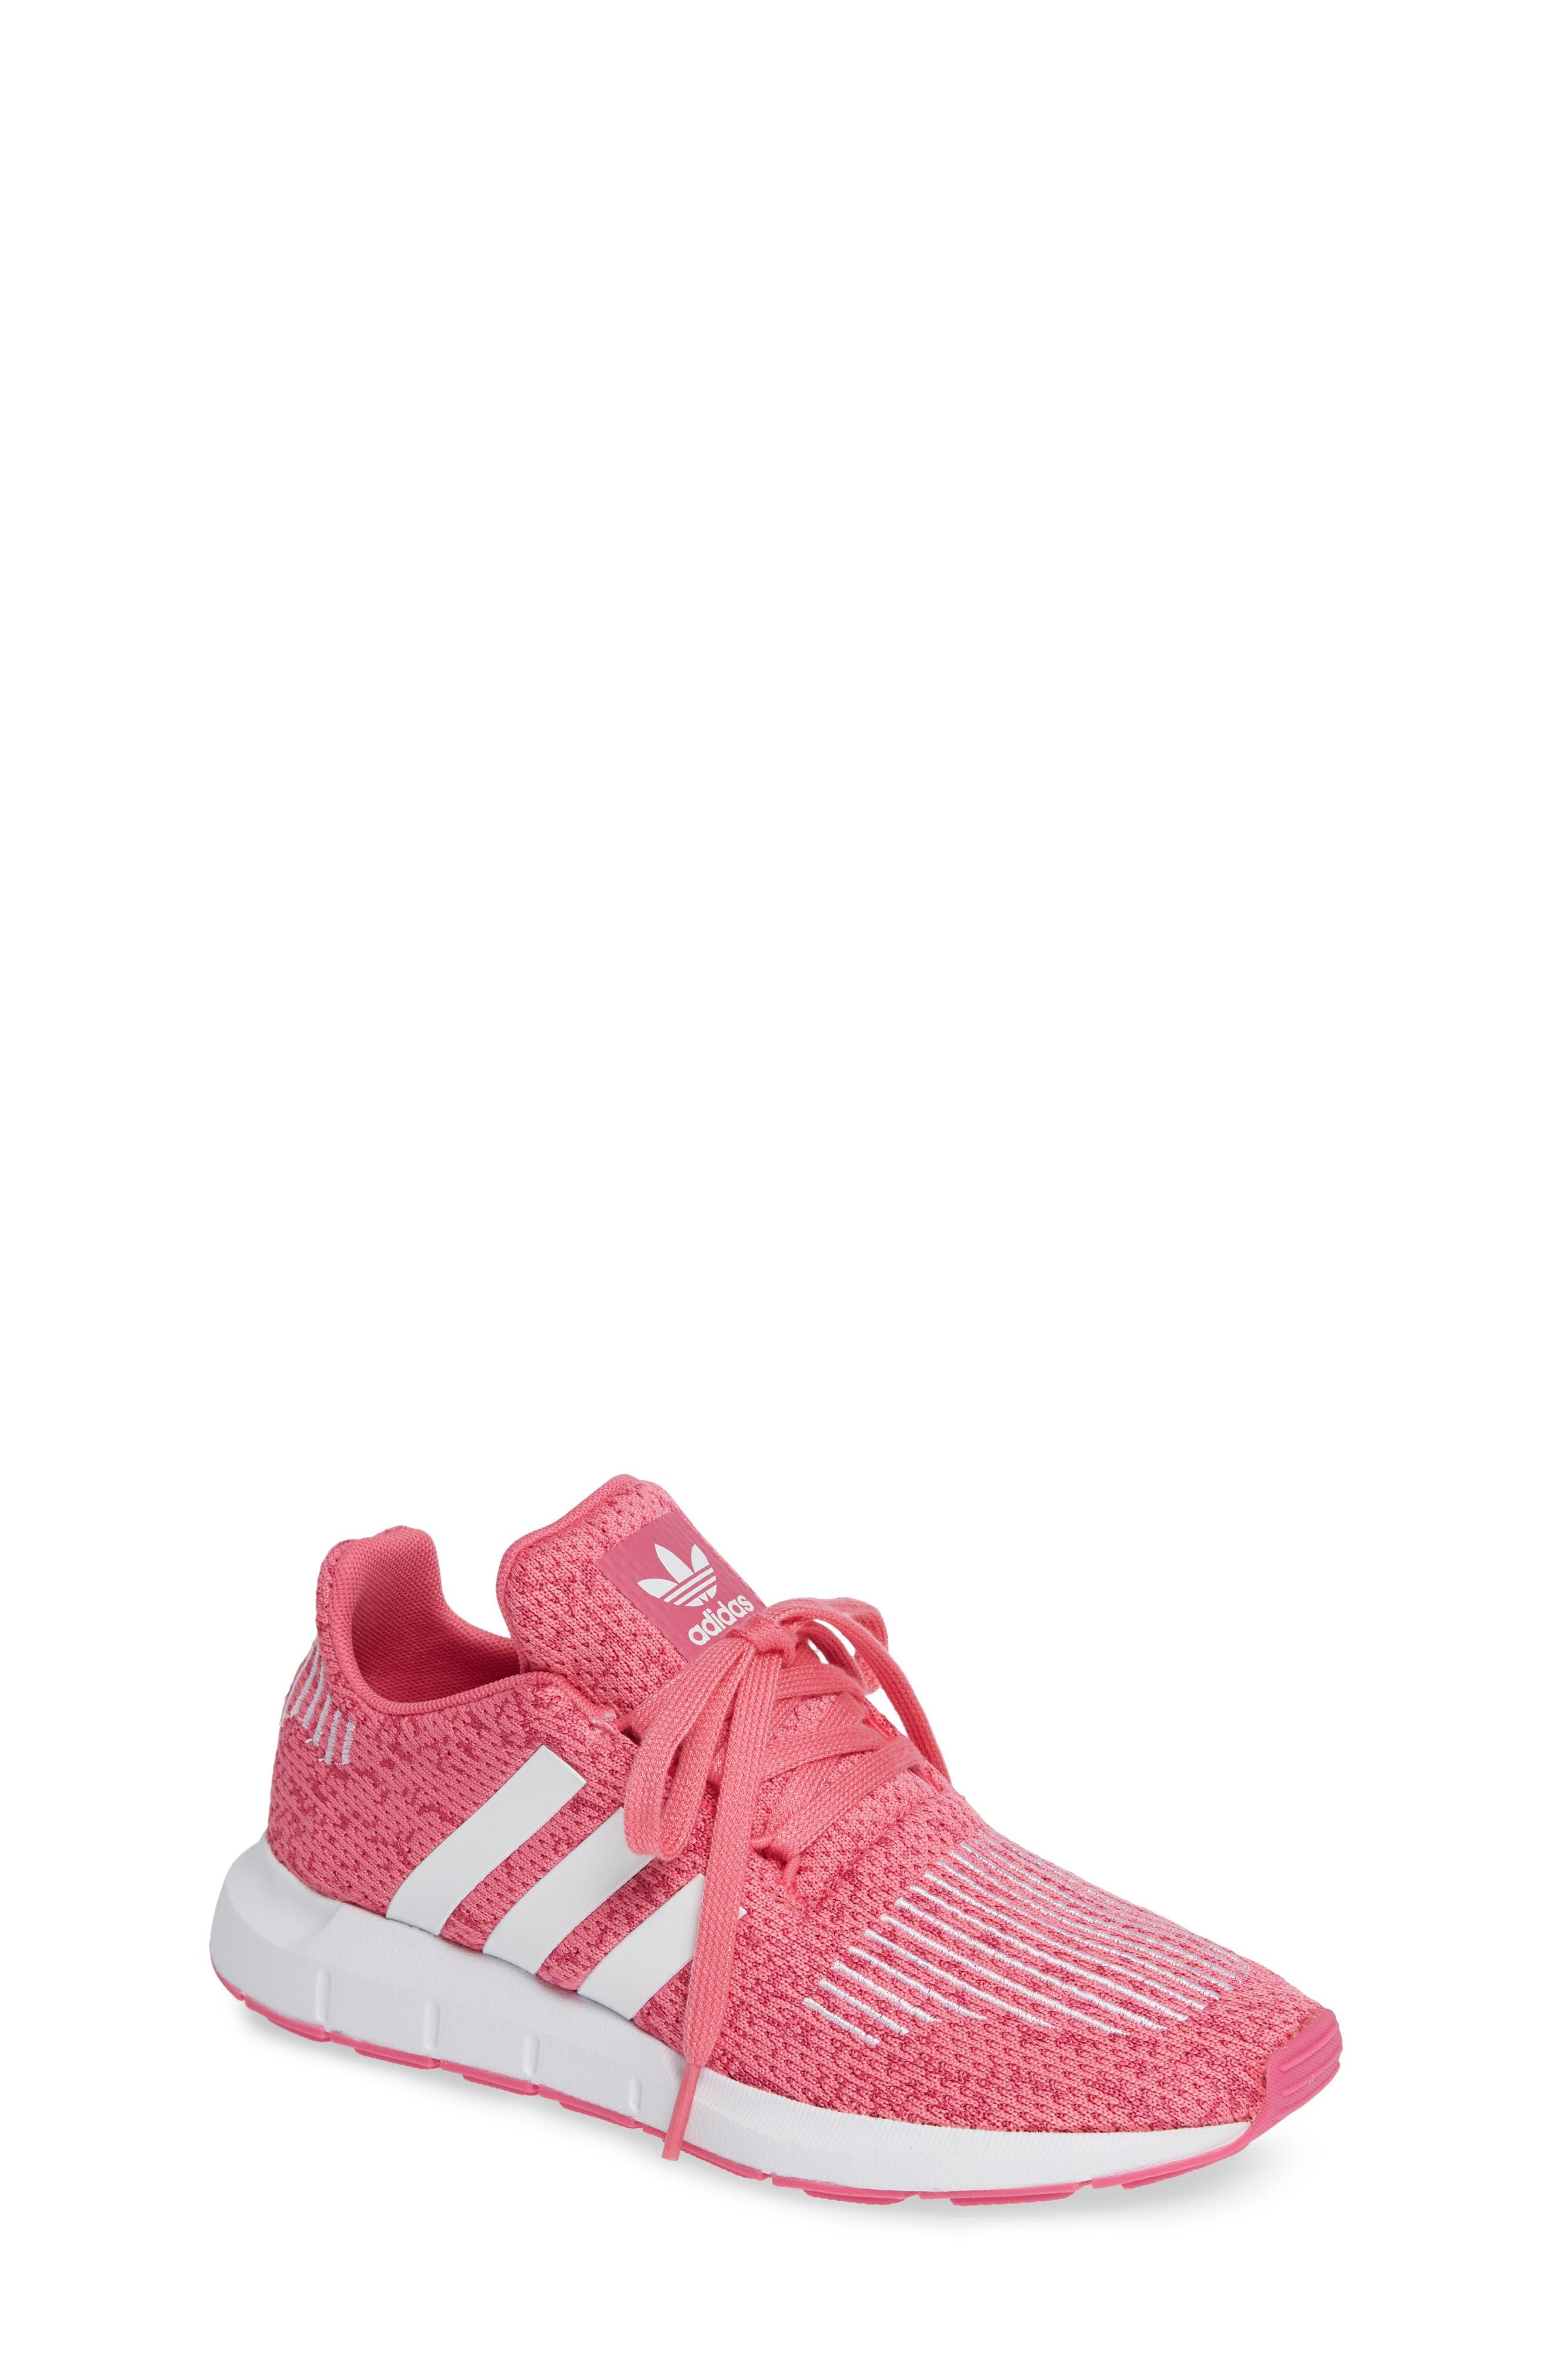 Swift Run J Sneaker,                         Main,                         color, SEMI SOLAR PINK/ WHITE